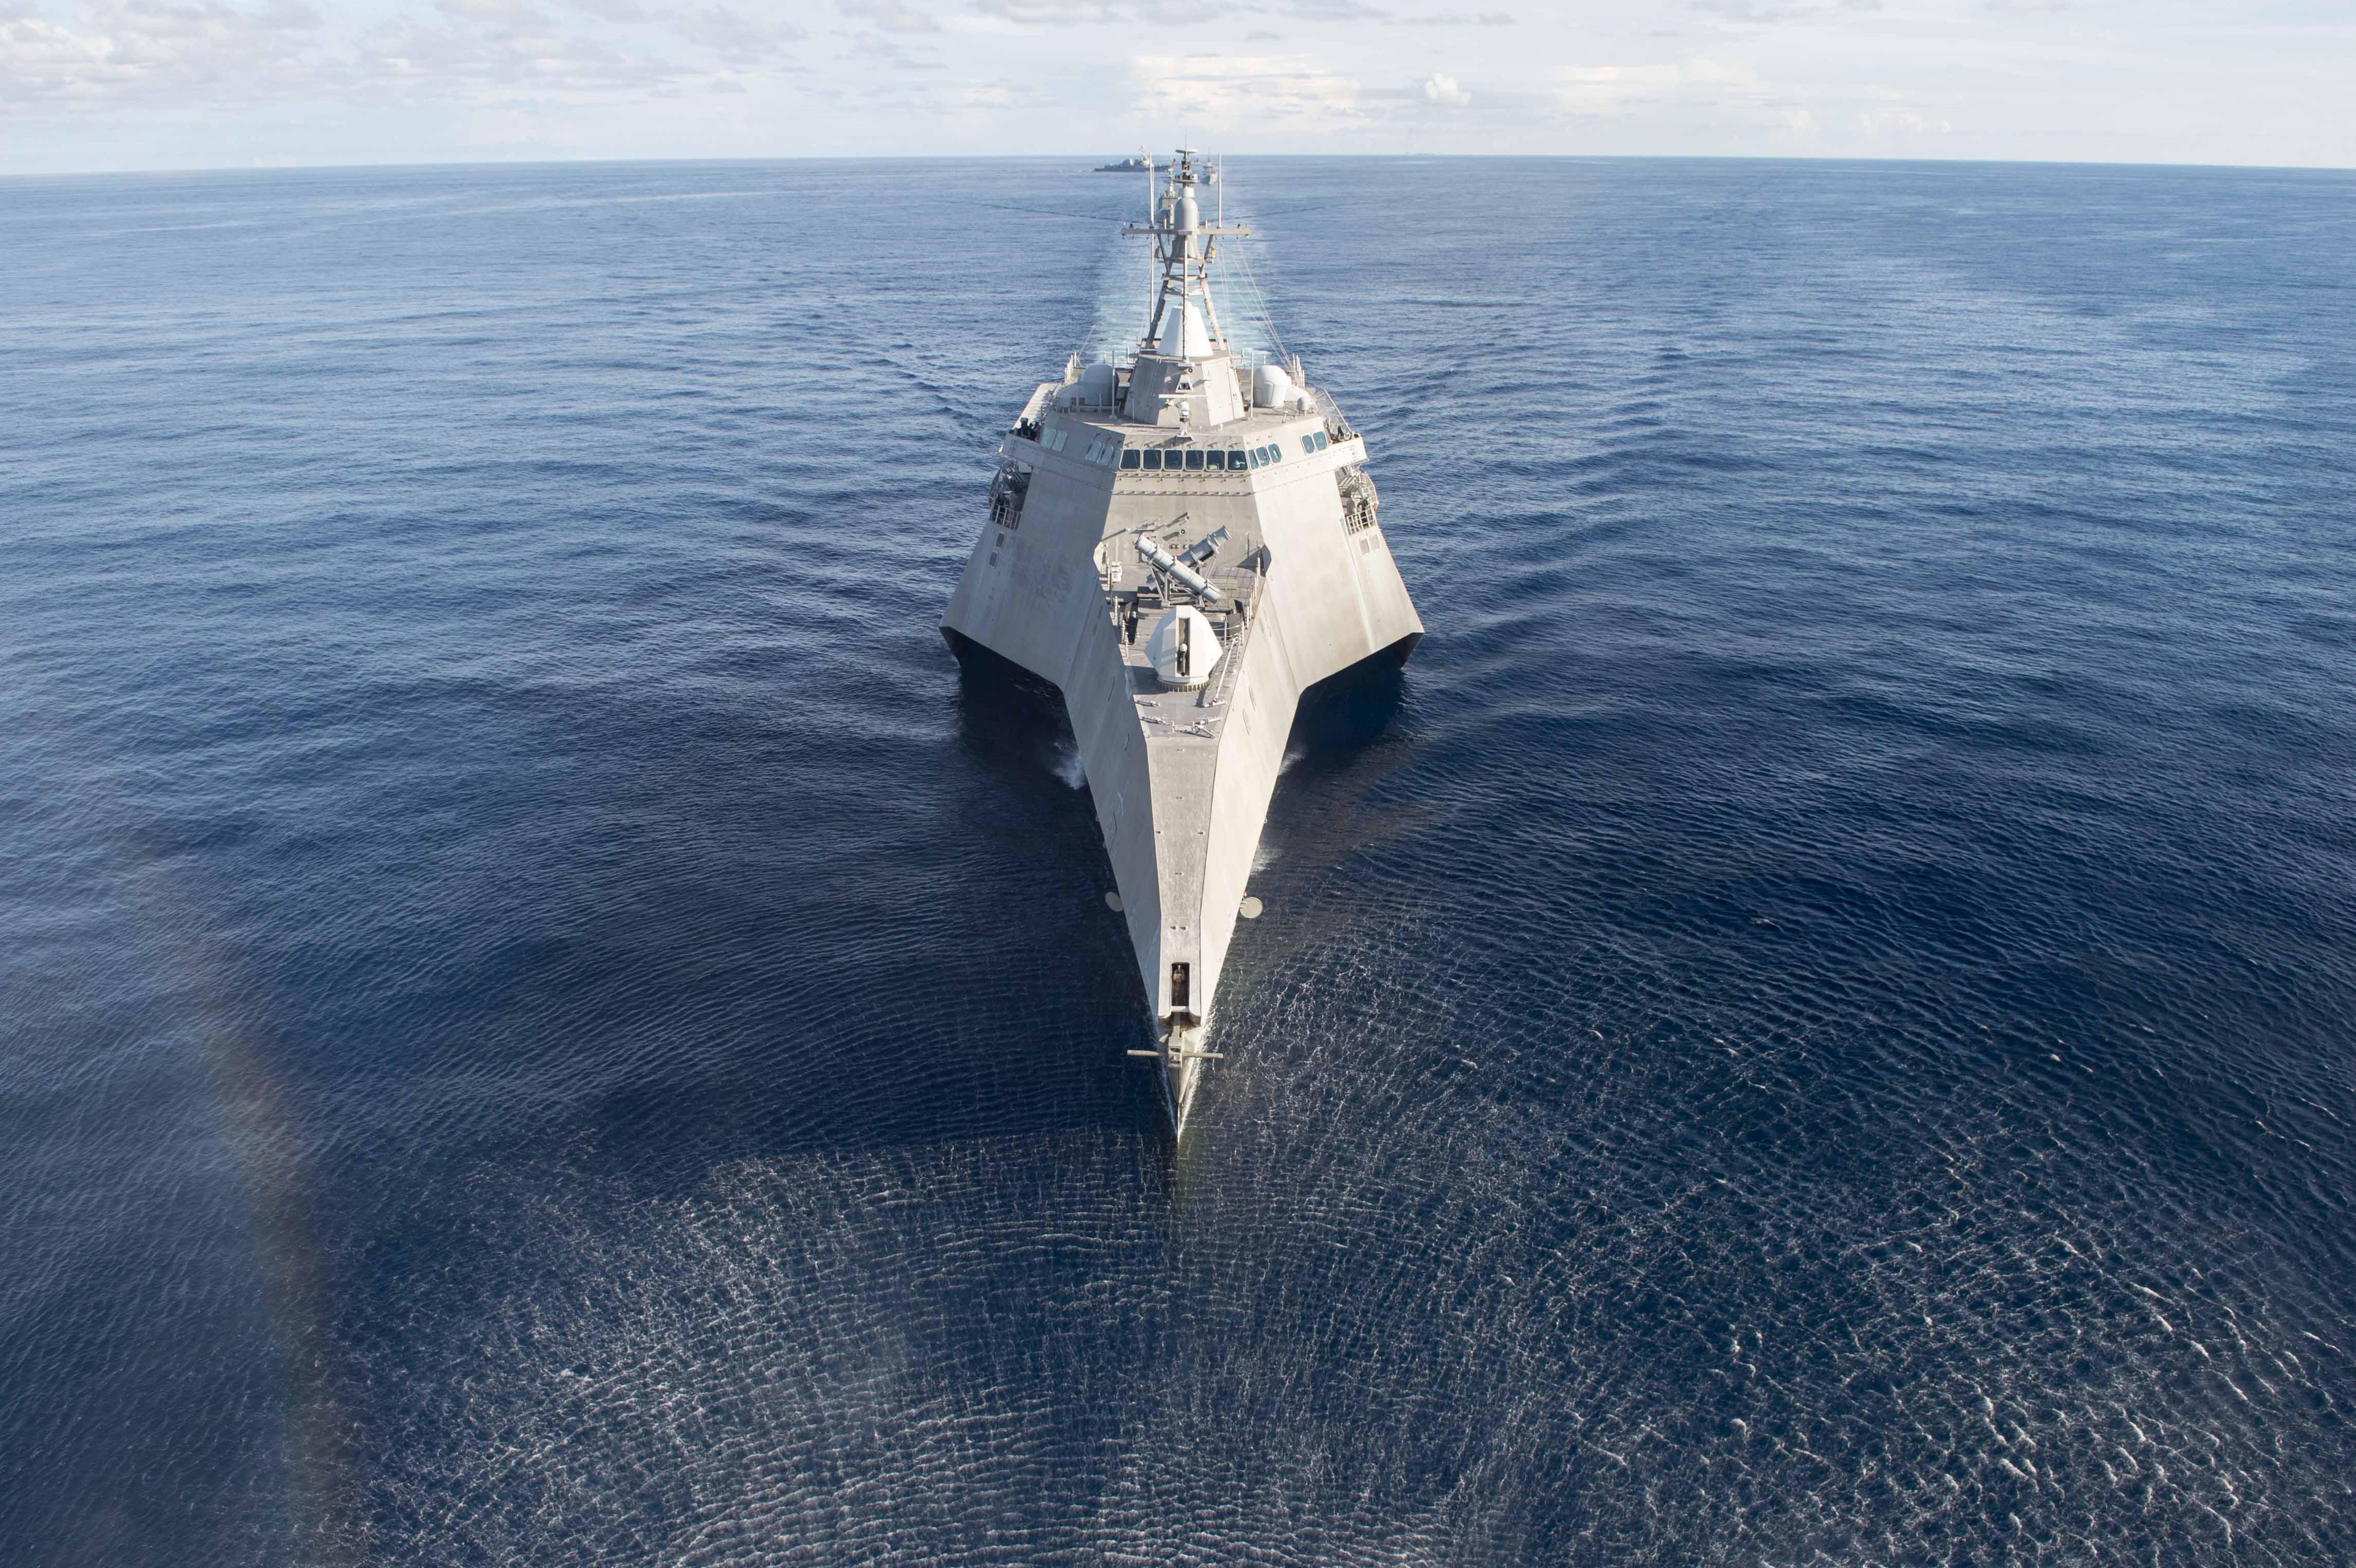 LCS : Littoral Combat Ship - Page 4 34453846072_7a6b6ea69a_o